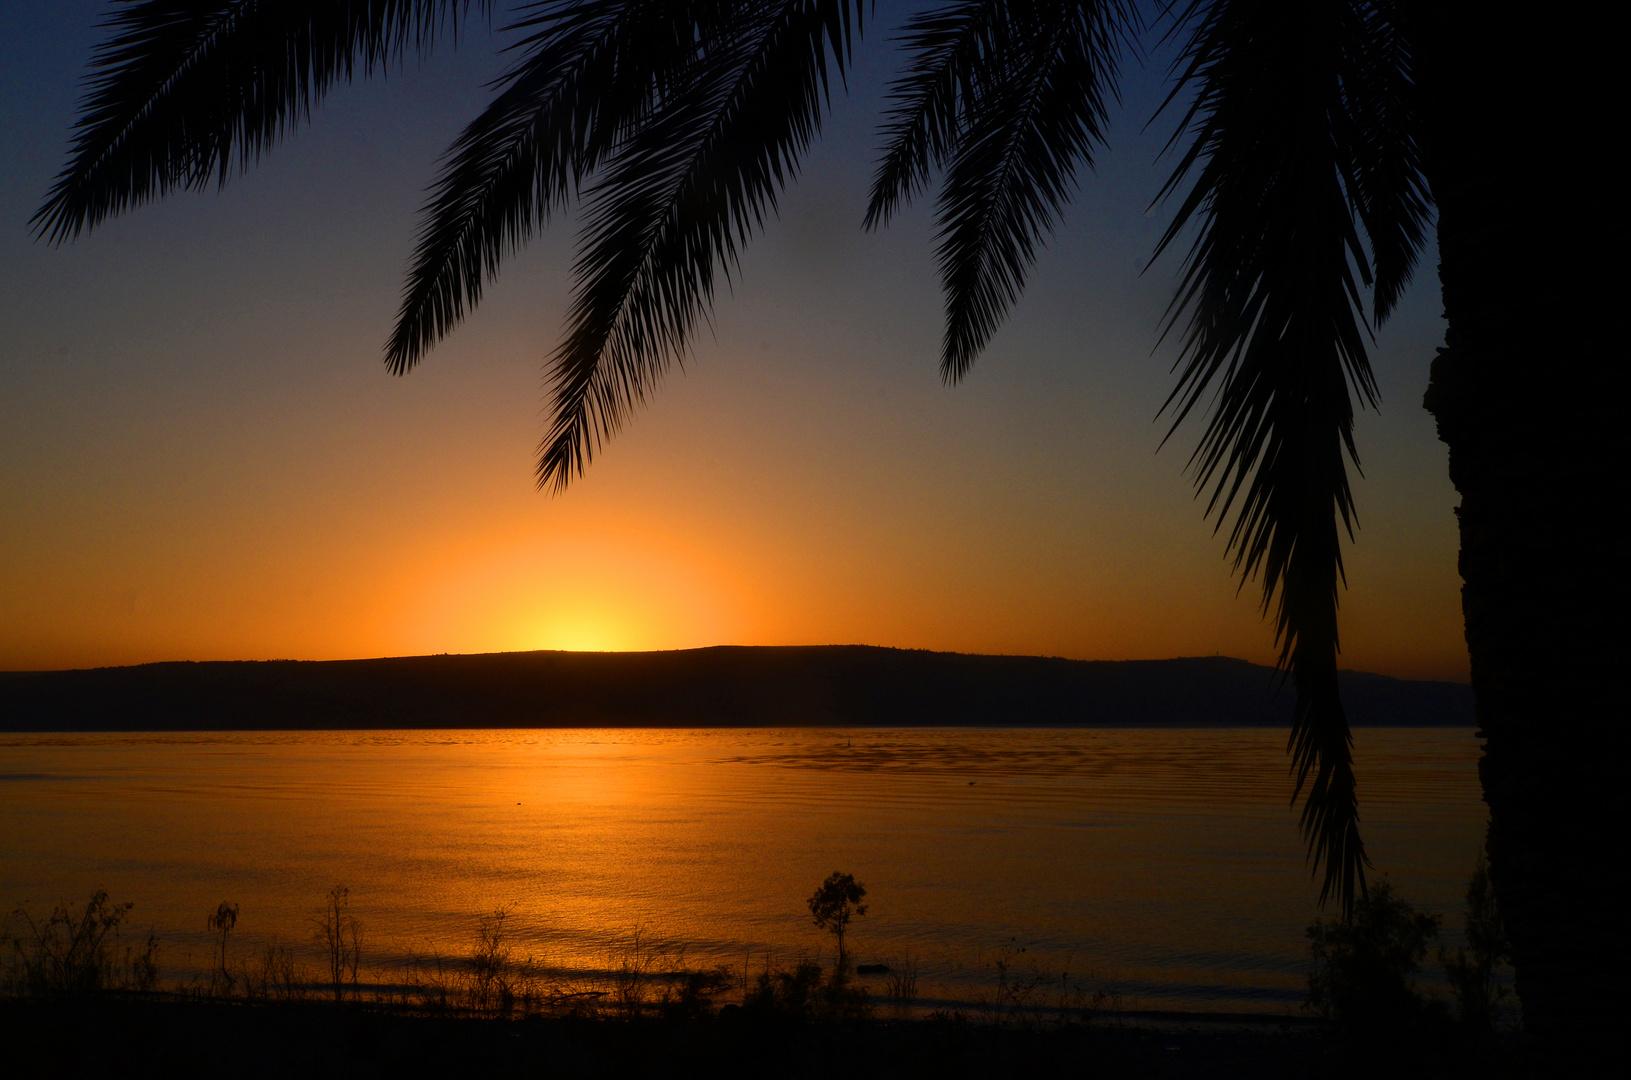 Sonnenuntergang hinter den Bergen Galiläas am See Genezareth